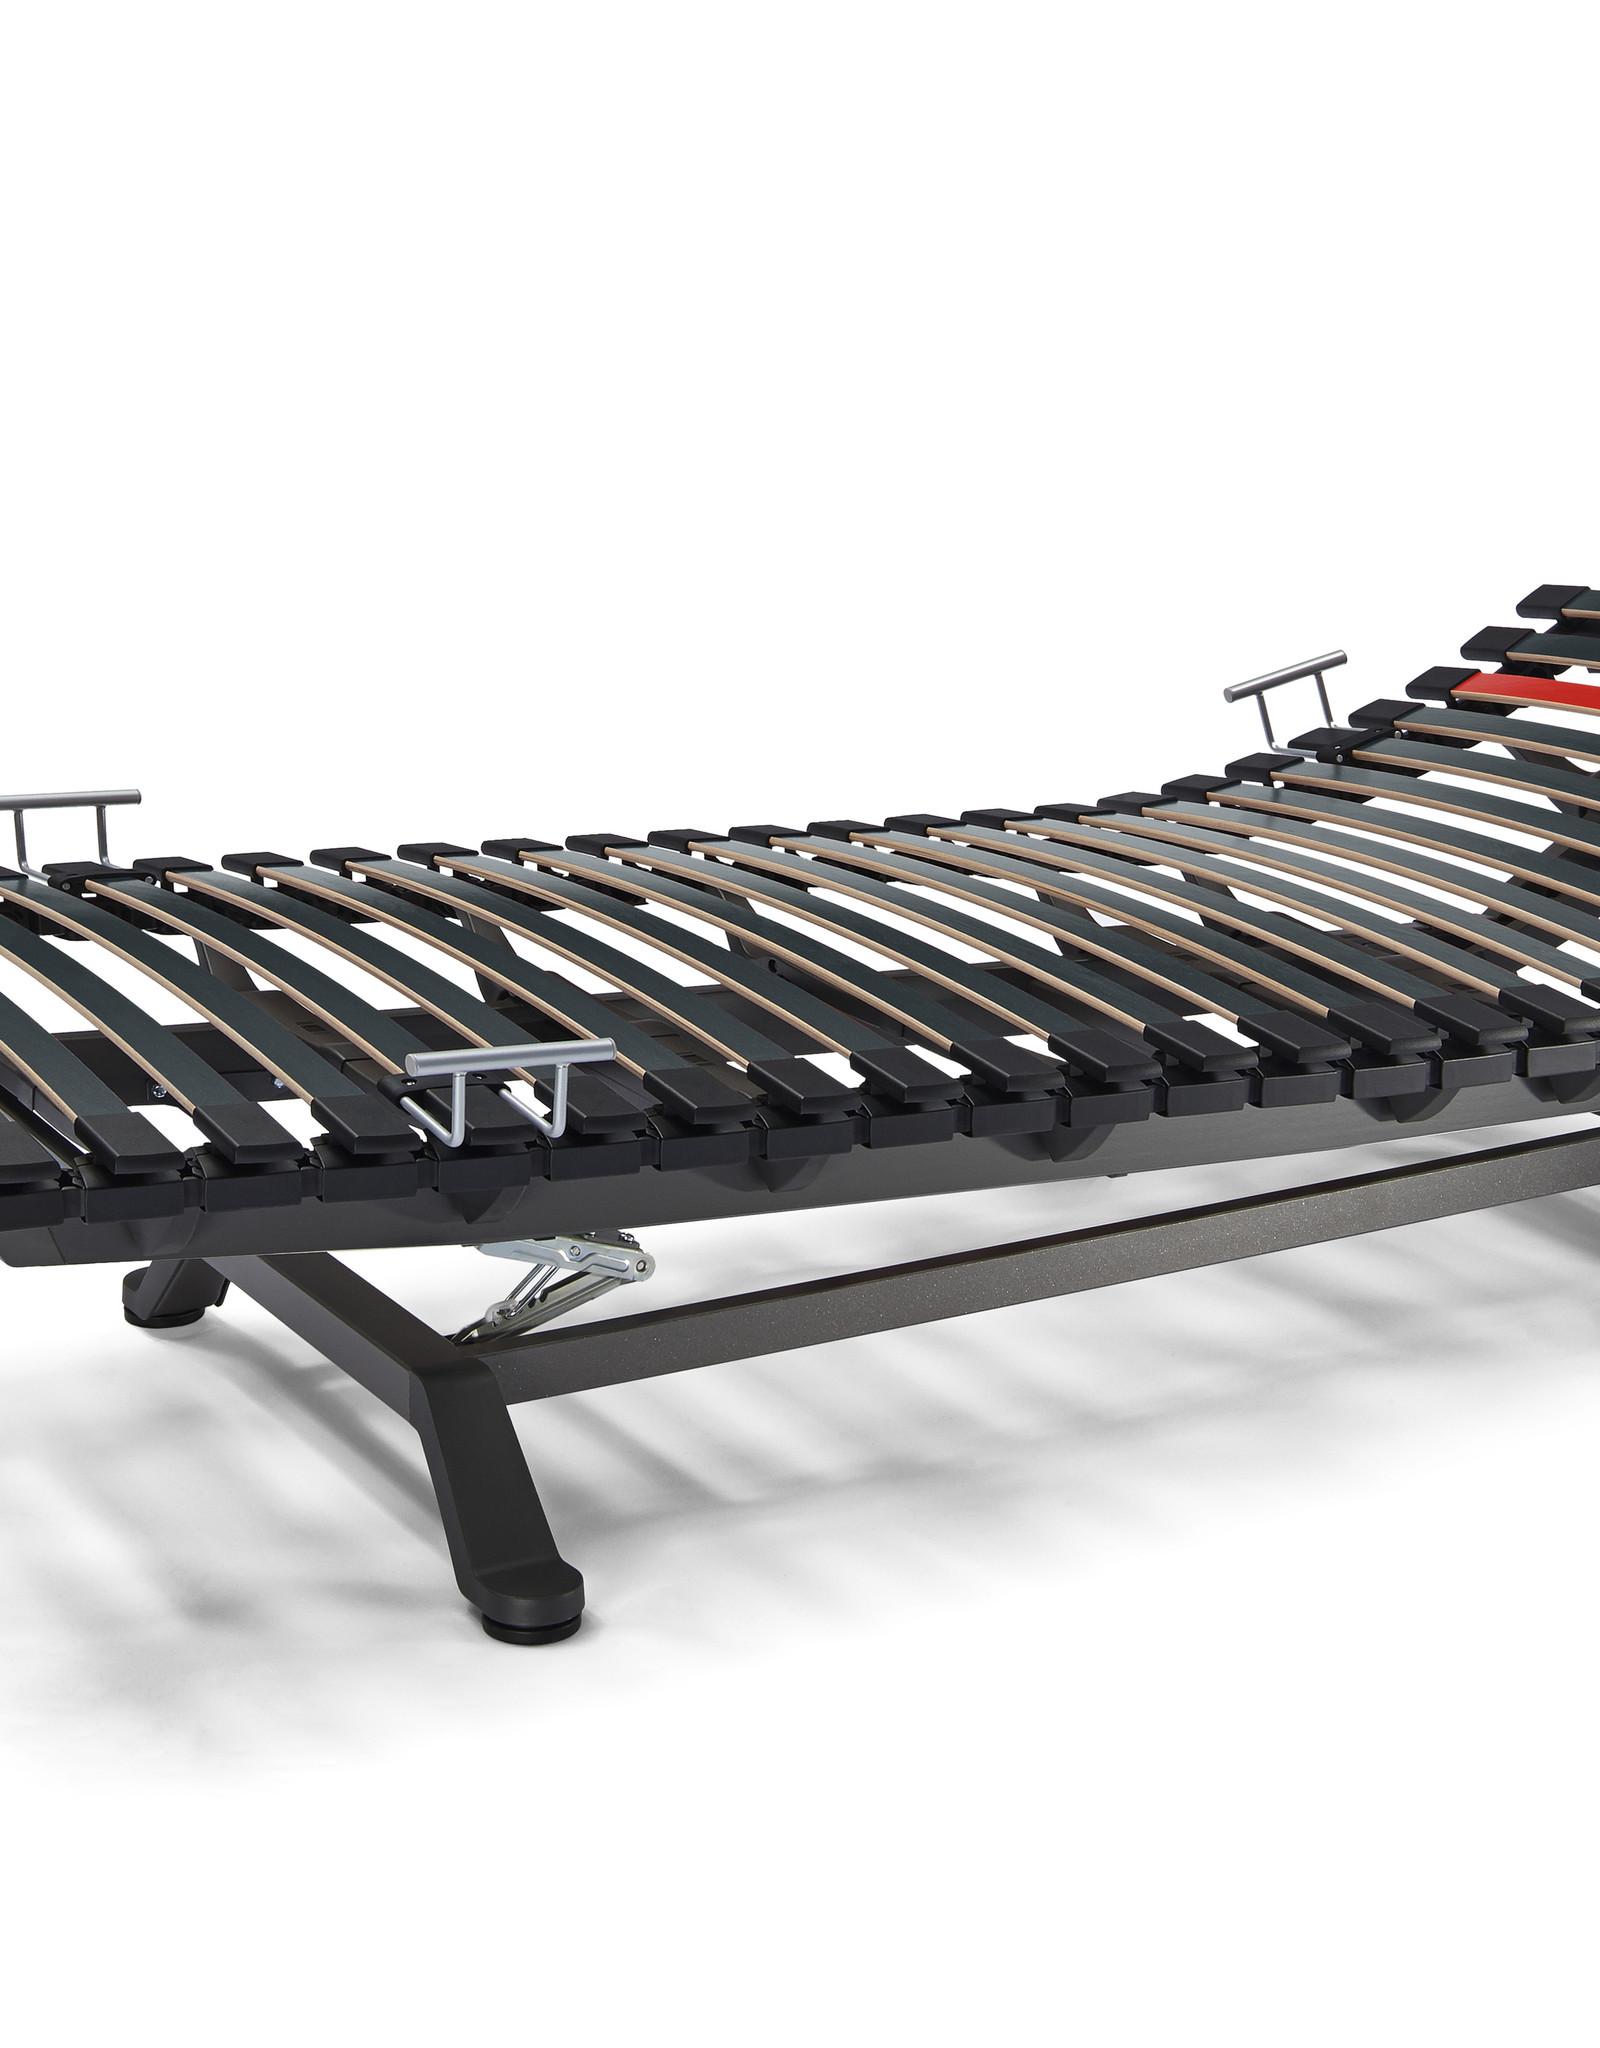 Swissflex Lattenbodem Uni 22-25 Bridge hoofd & voet